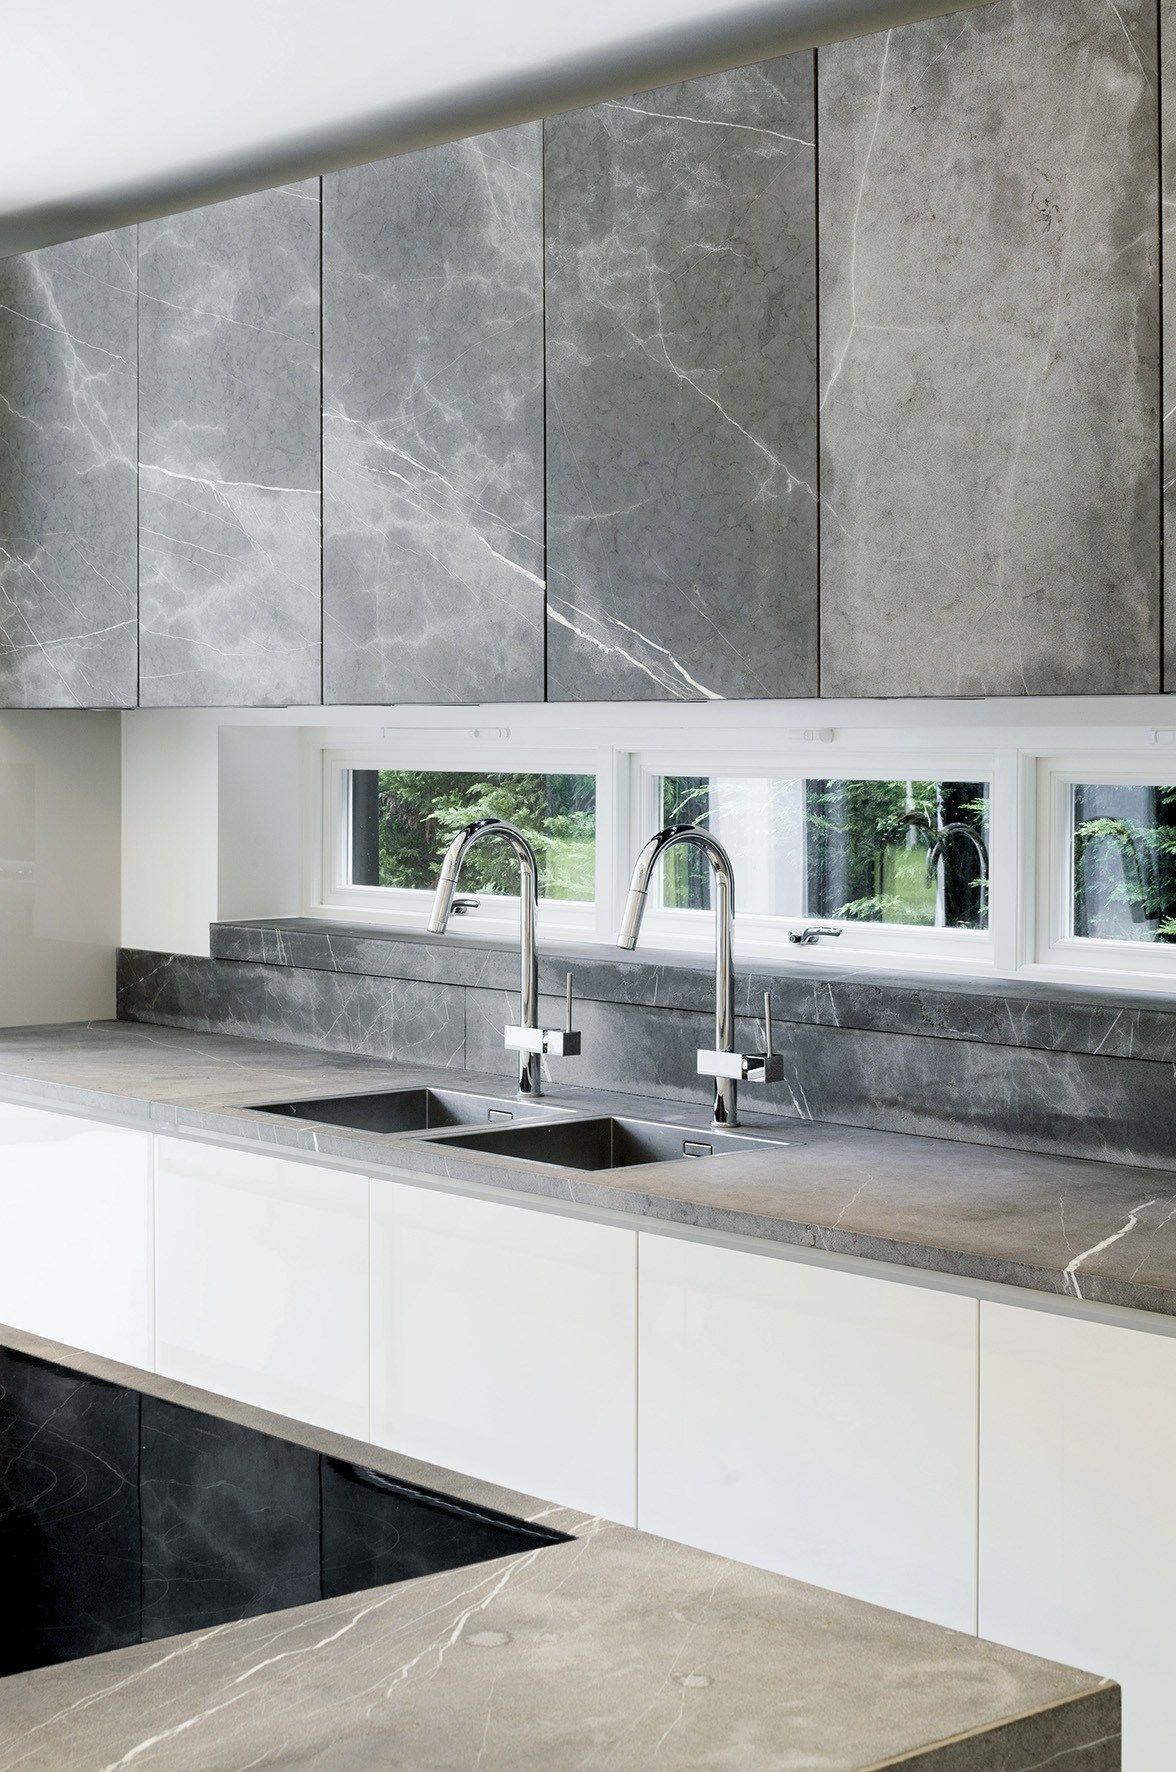 T45 Cucina in pietra naturale by TM Italia Cucine